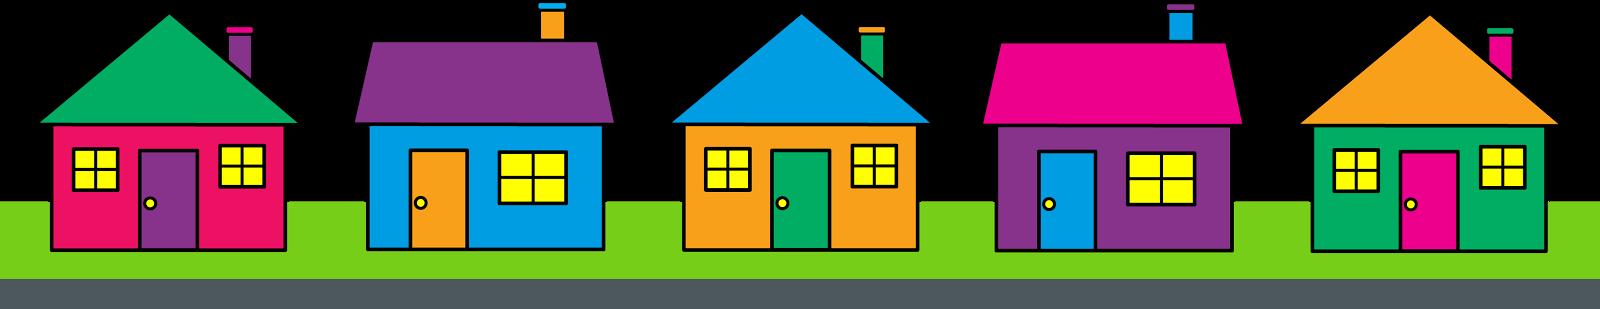 Neighborhood house clipart jpg free stock The Settlement on Wilmington jpg free stock